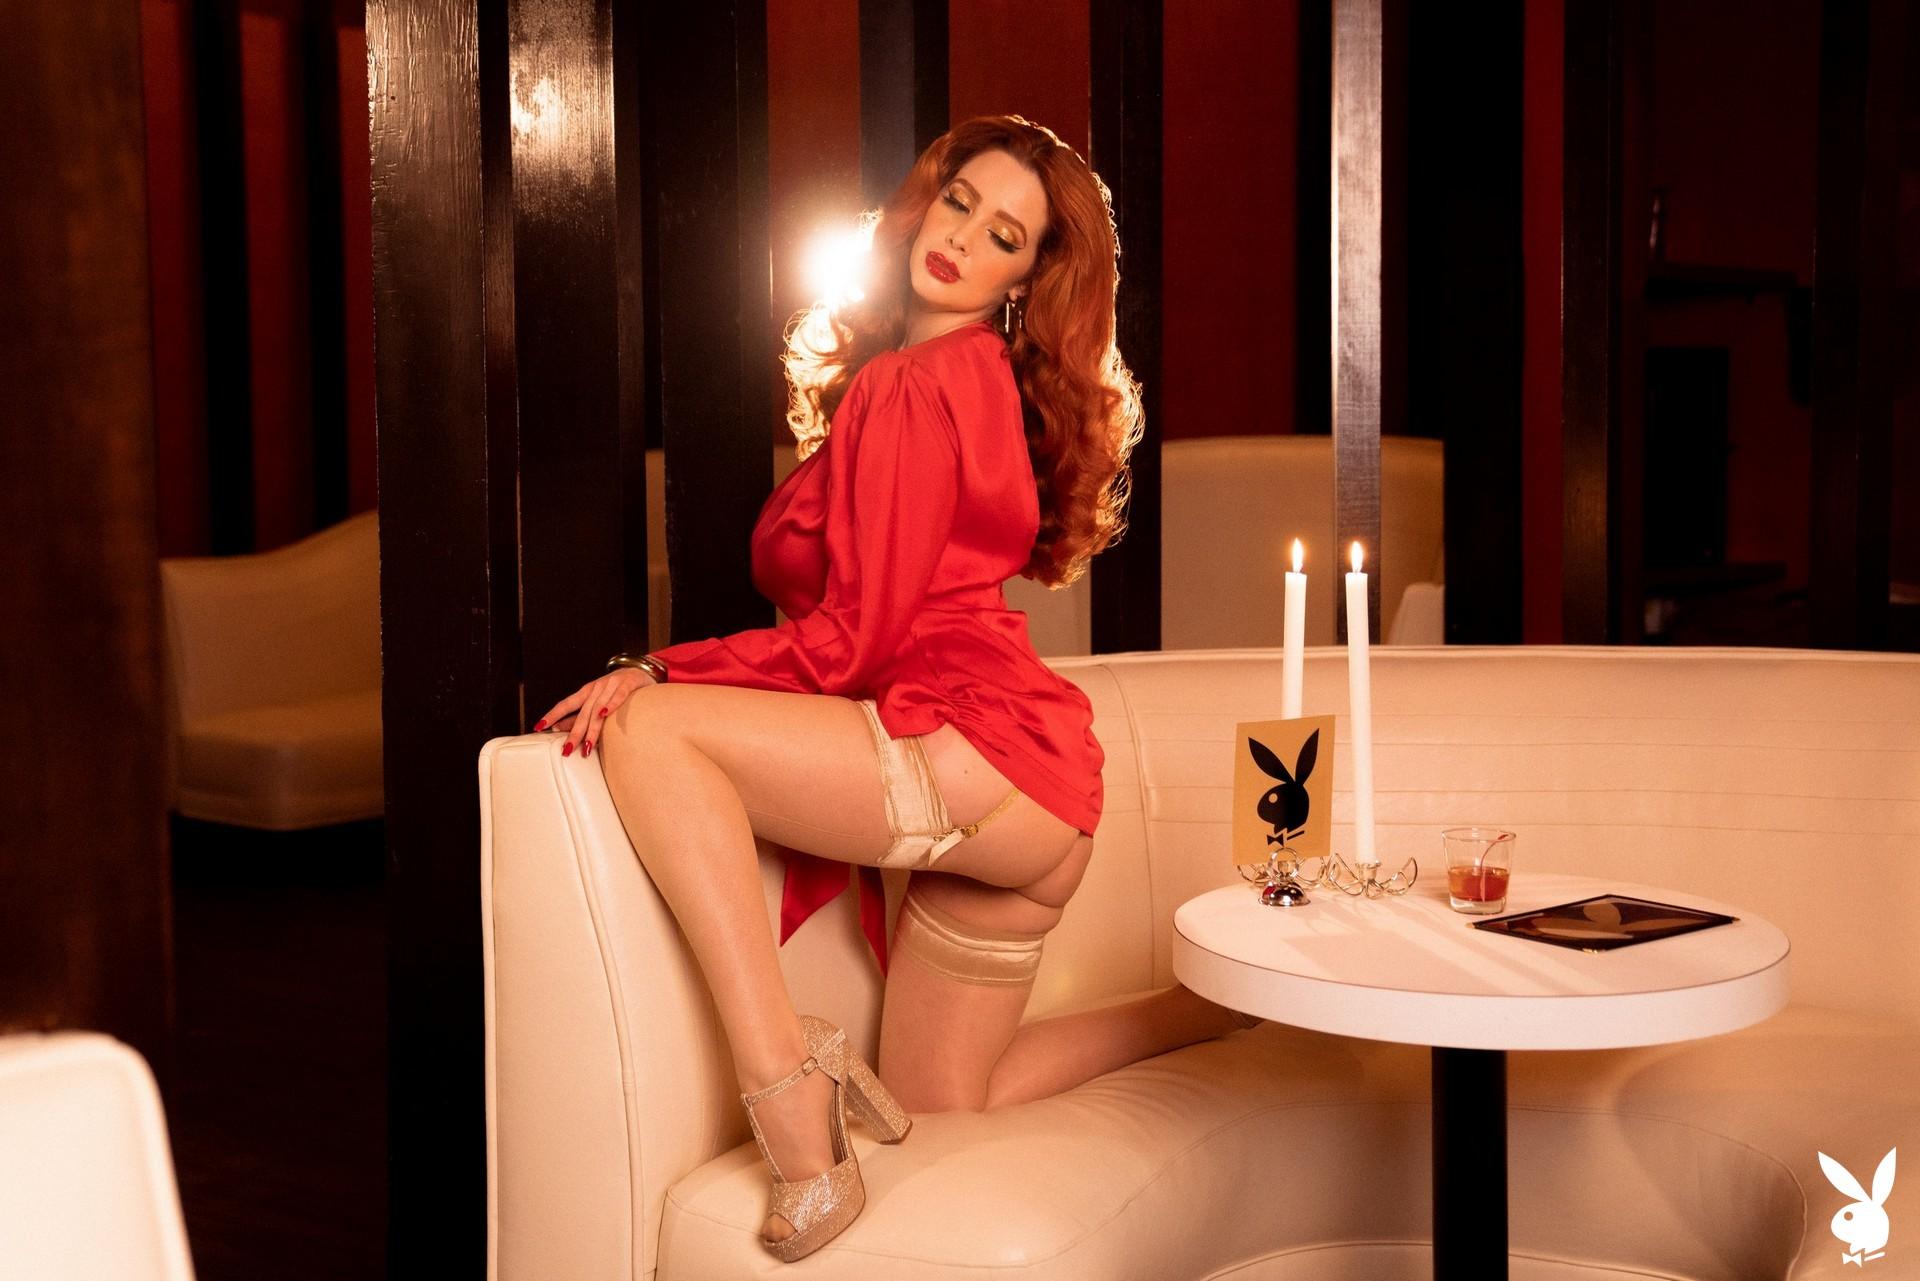 Minxie In Private Affair Playboy Plus (2)